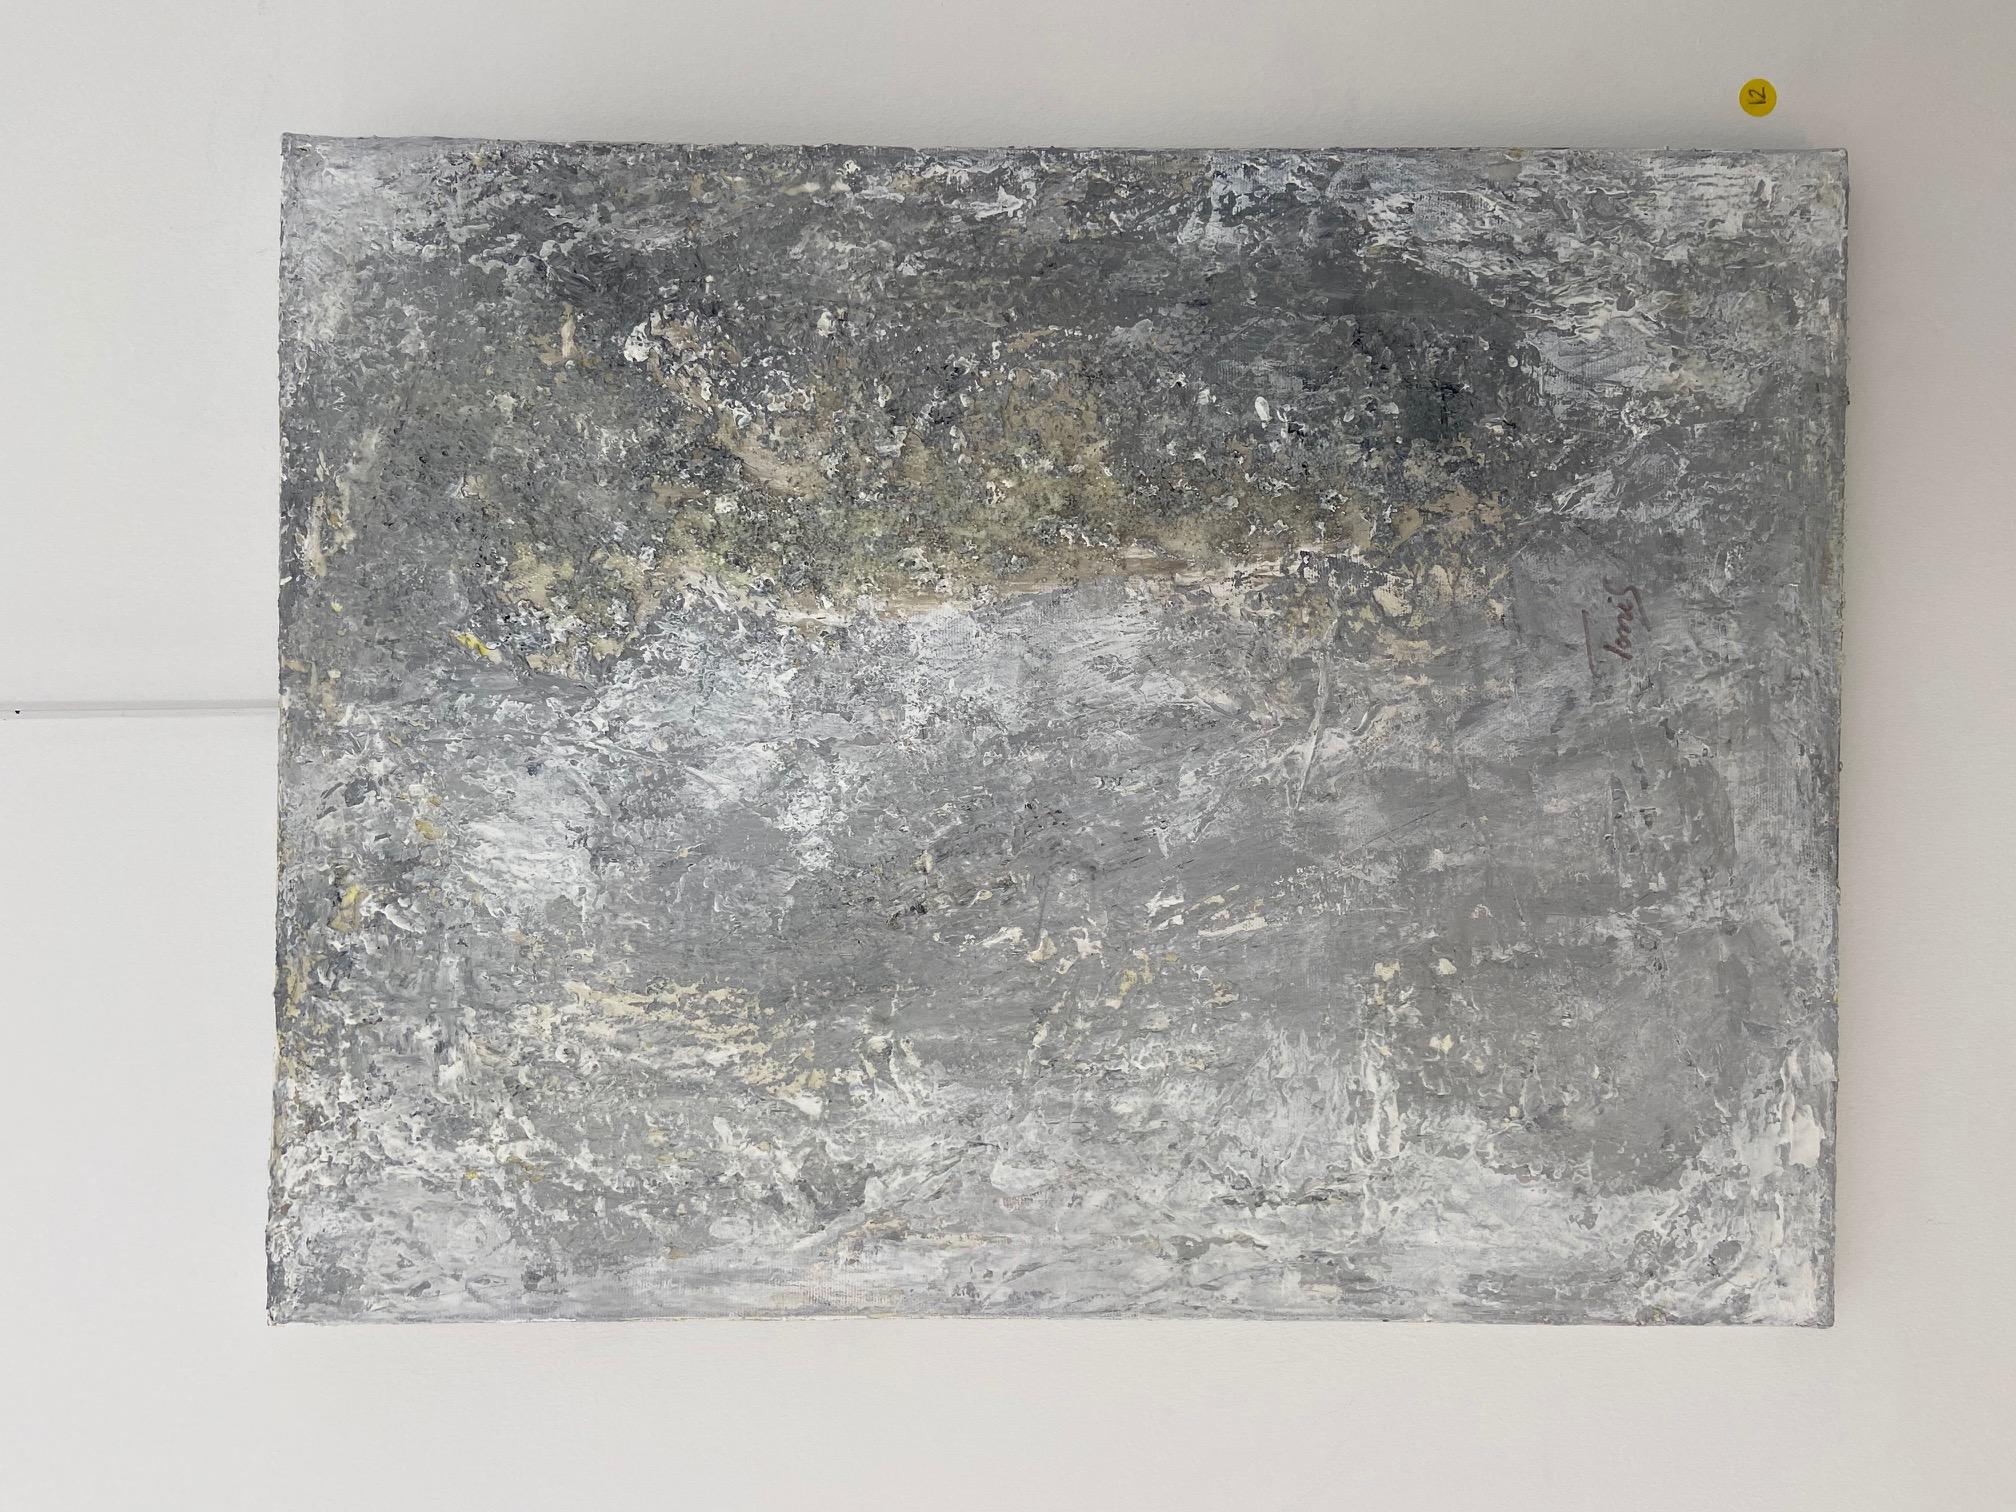 12.Toni Simone Stochfleth, Illusion